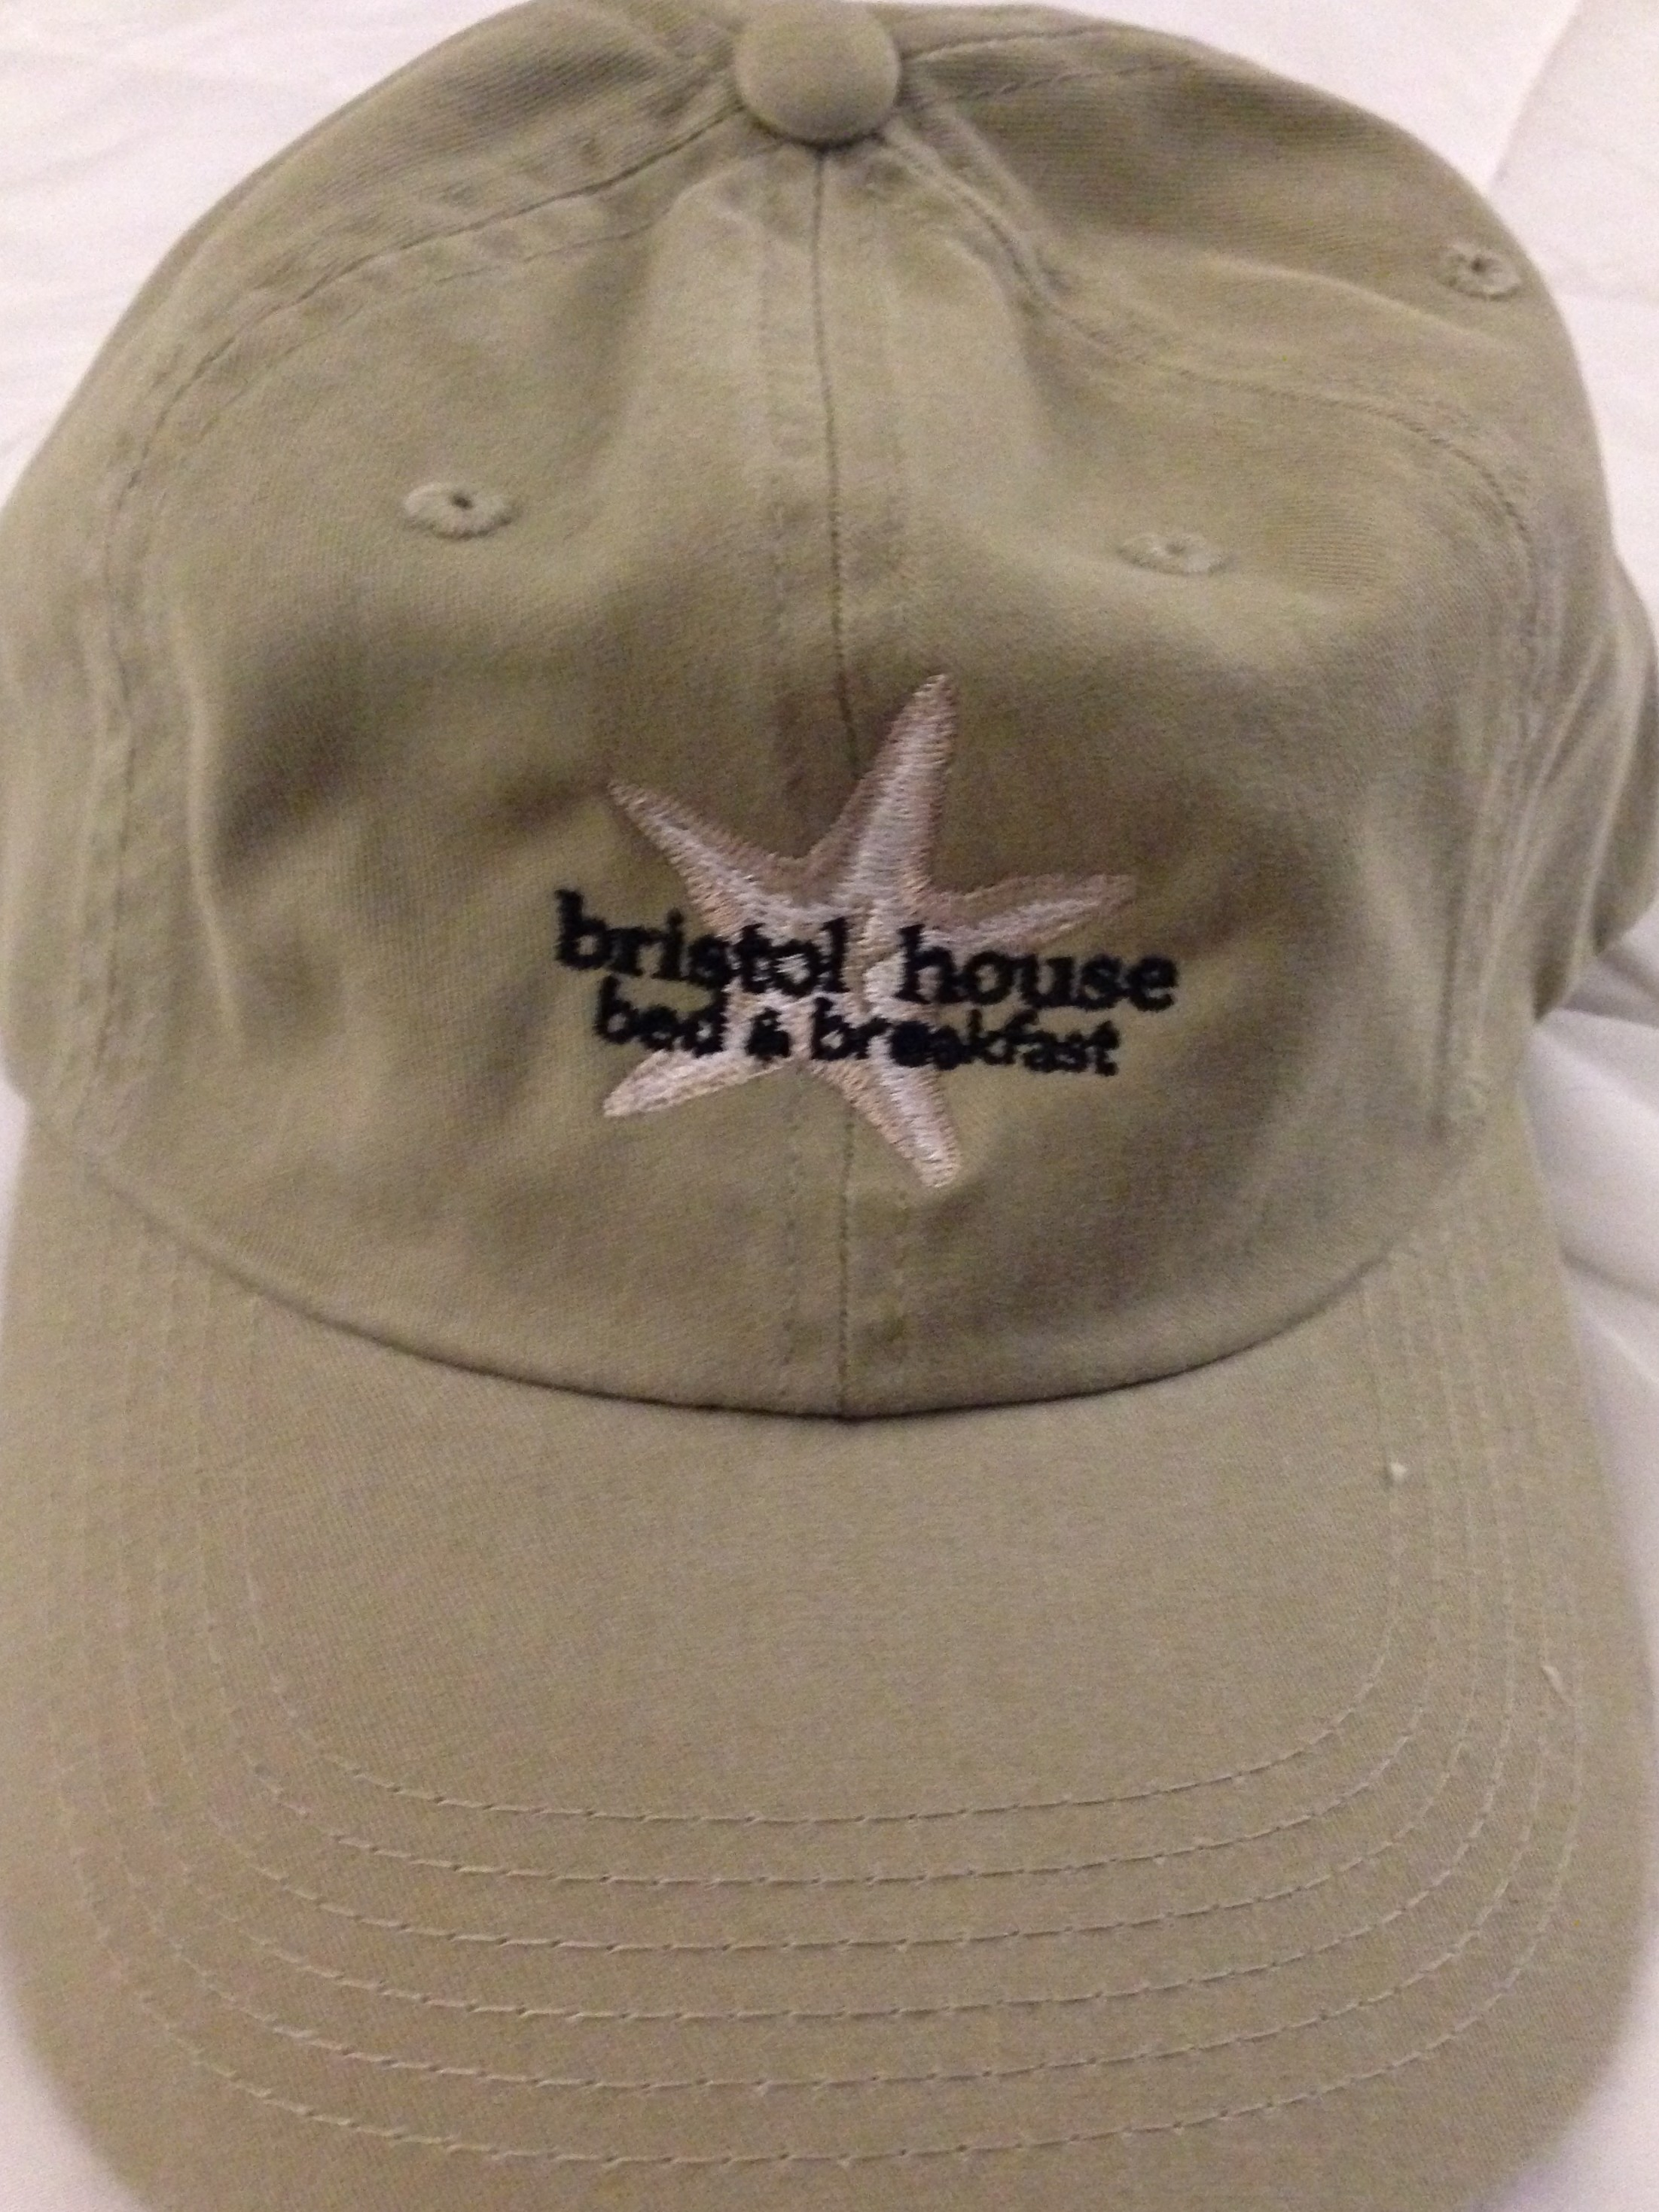 Bristol House Cap